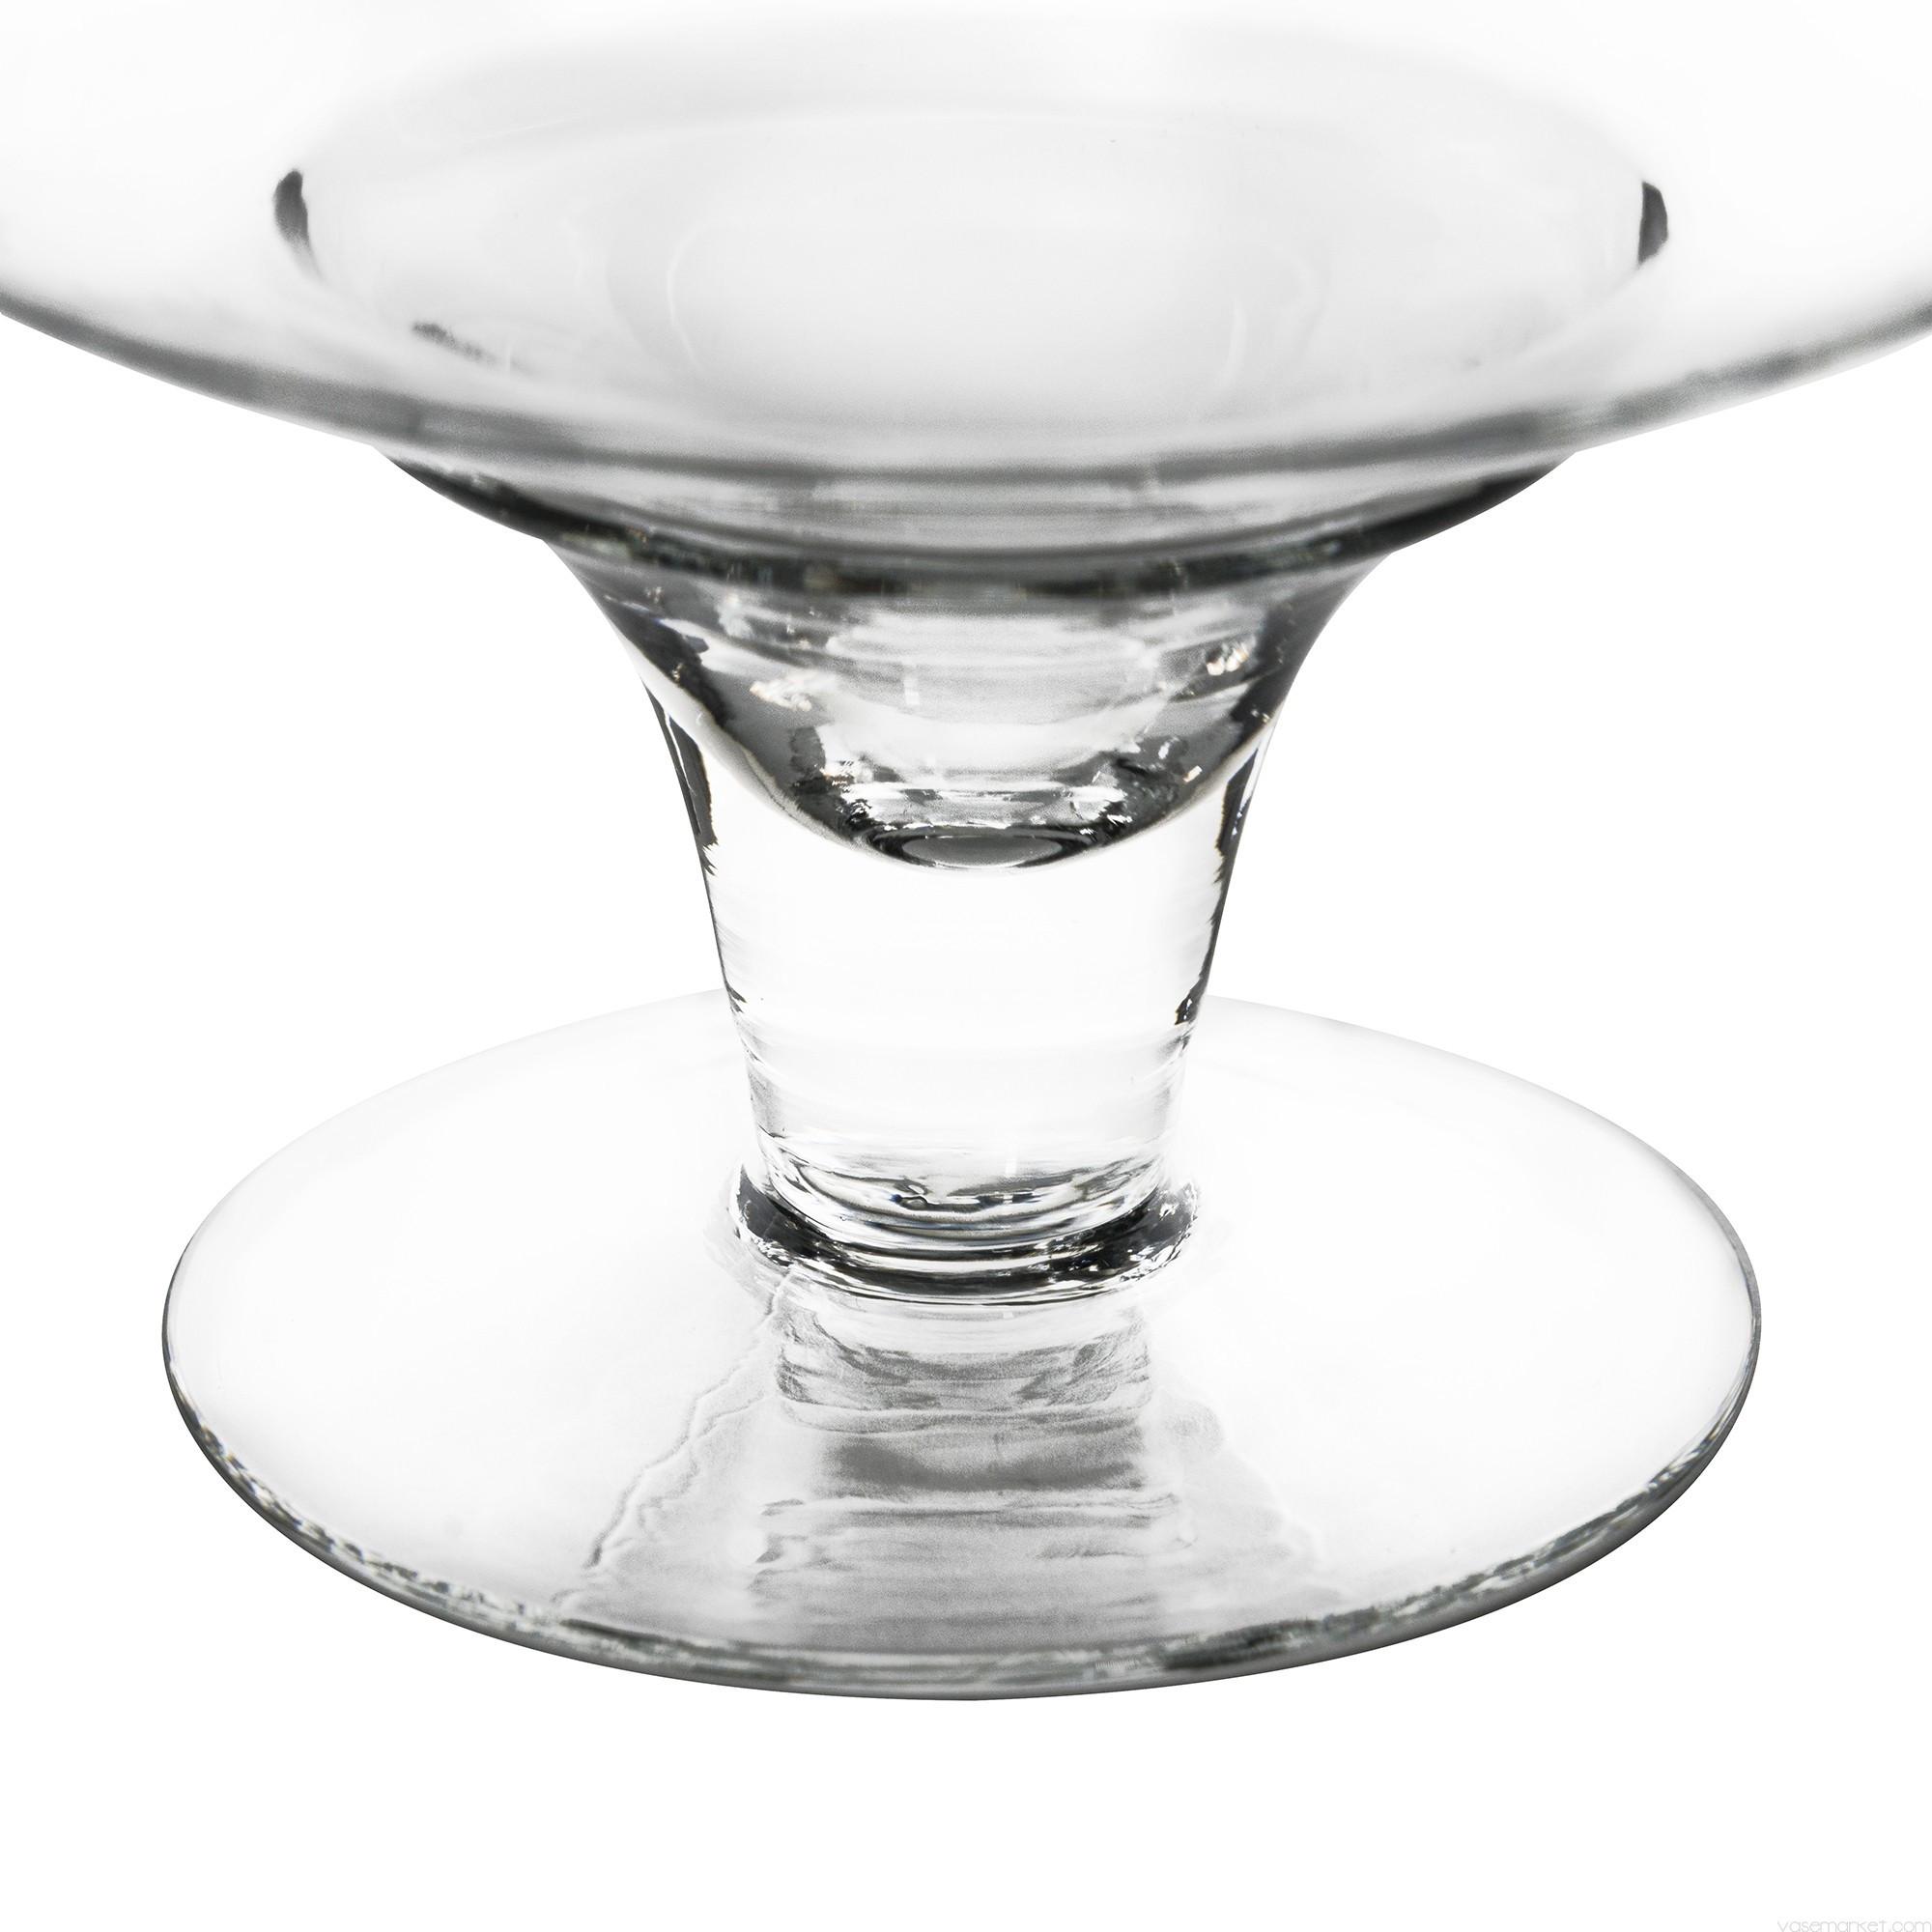 10 inch cylinder vases wholesale of 10 inch tall glass wedding candy buffet apothecary jar regarding https vasemarket c3e2 kxcdn com media catalog product cache 1 image ac84806d6f5b96a7587ca55a9e71ab8c g a gaj108 10 details 04 glass apothecary jar h 10